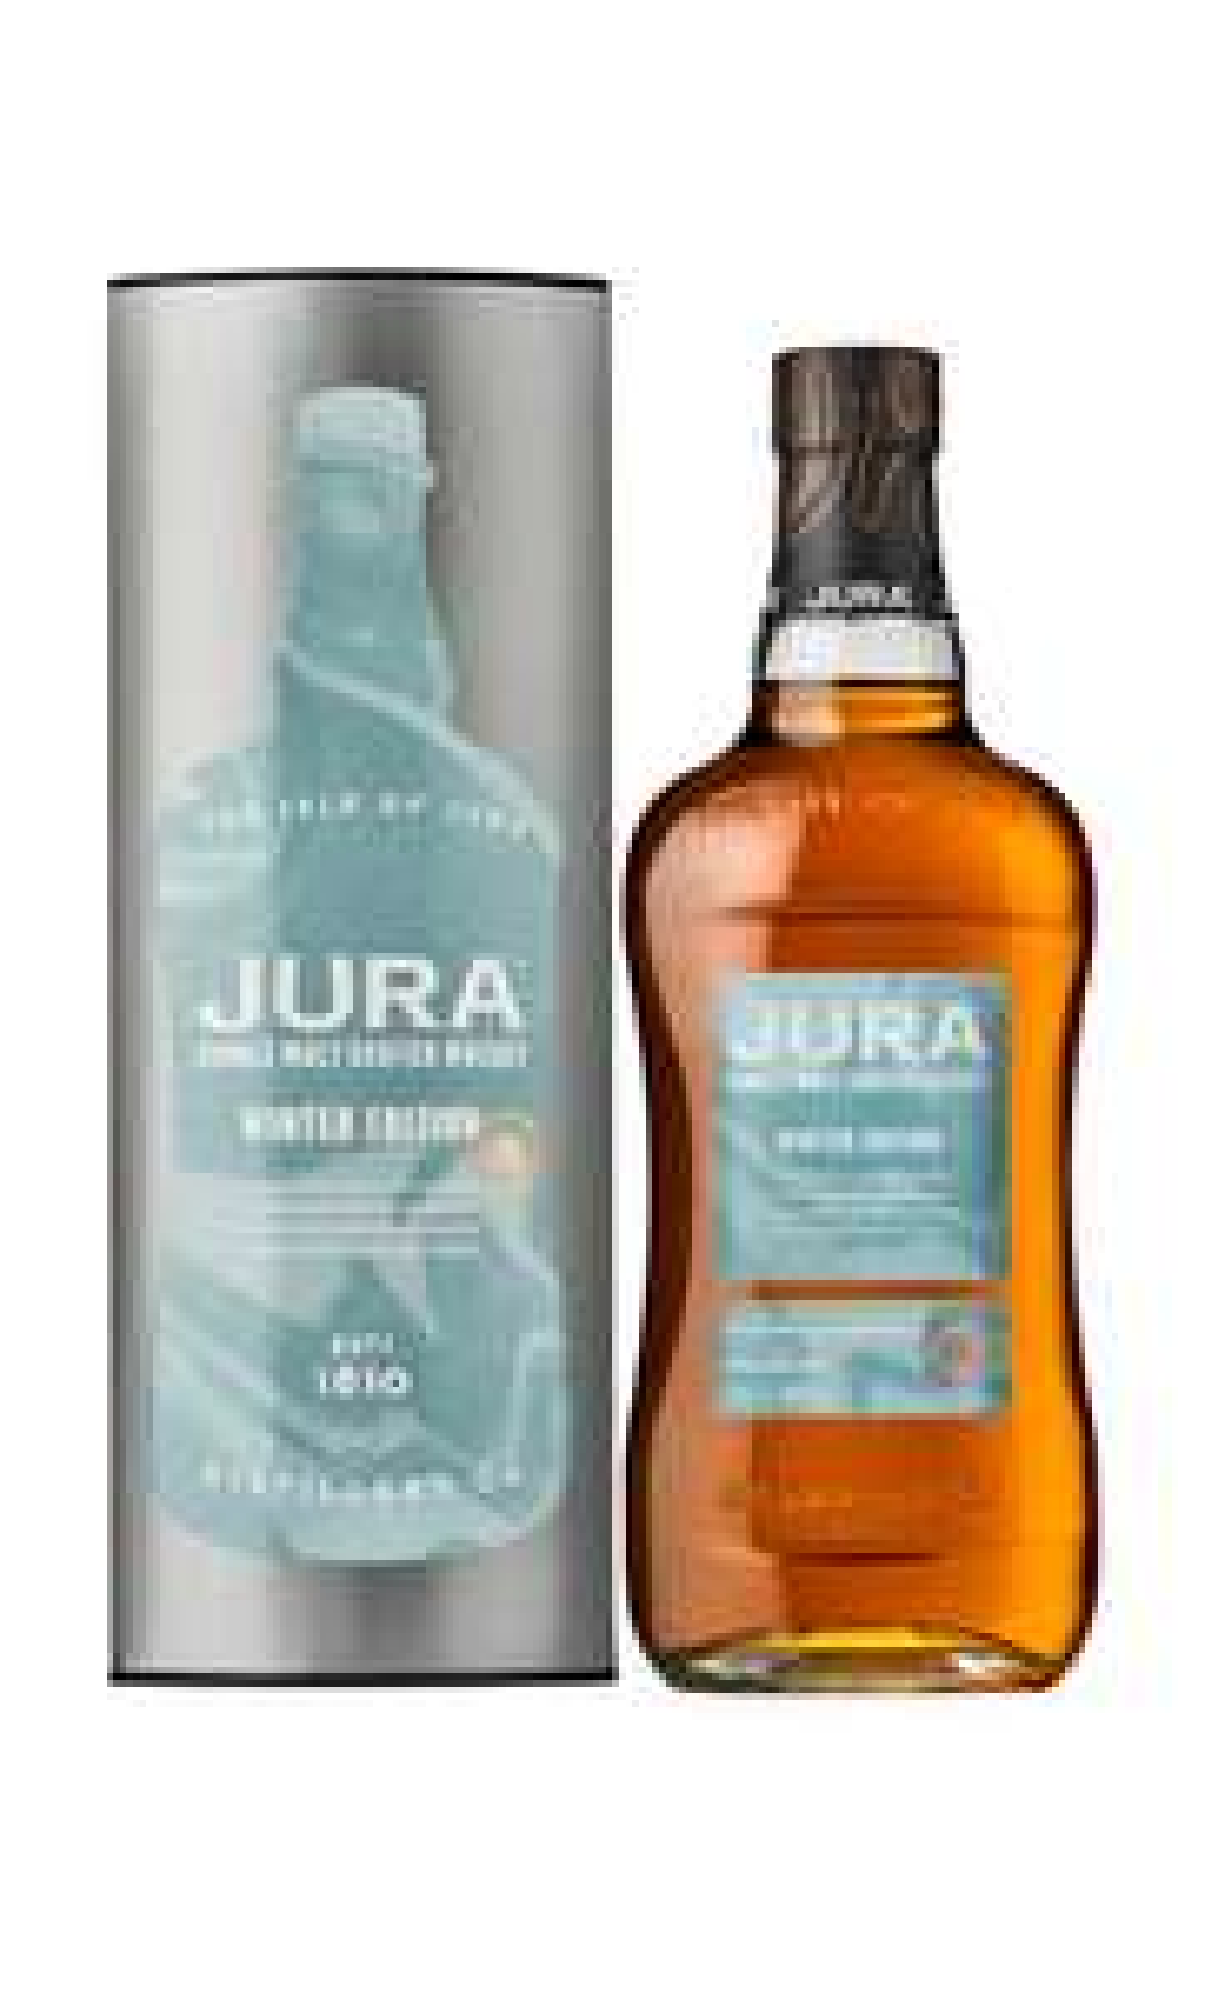 Jura Single Malt Scotch Whisky Winter Edition 1 Litre - £23.85 @ Tesco instore